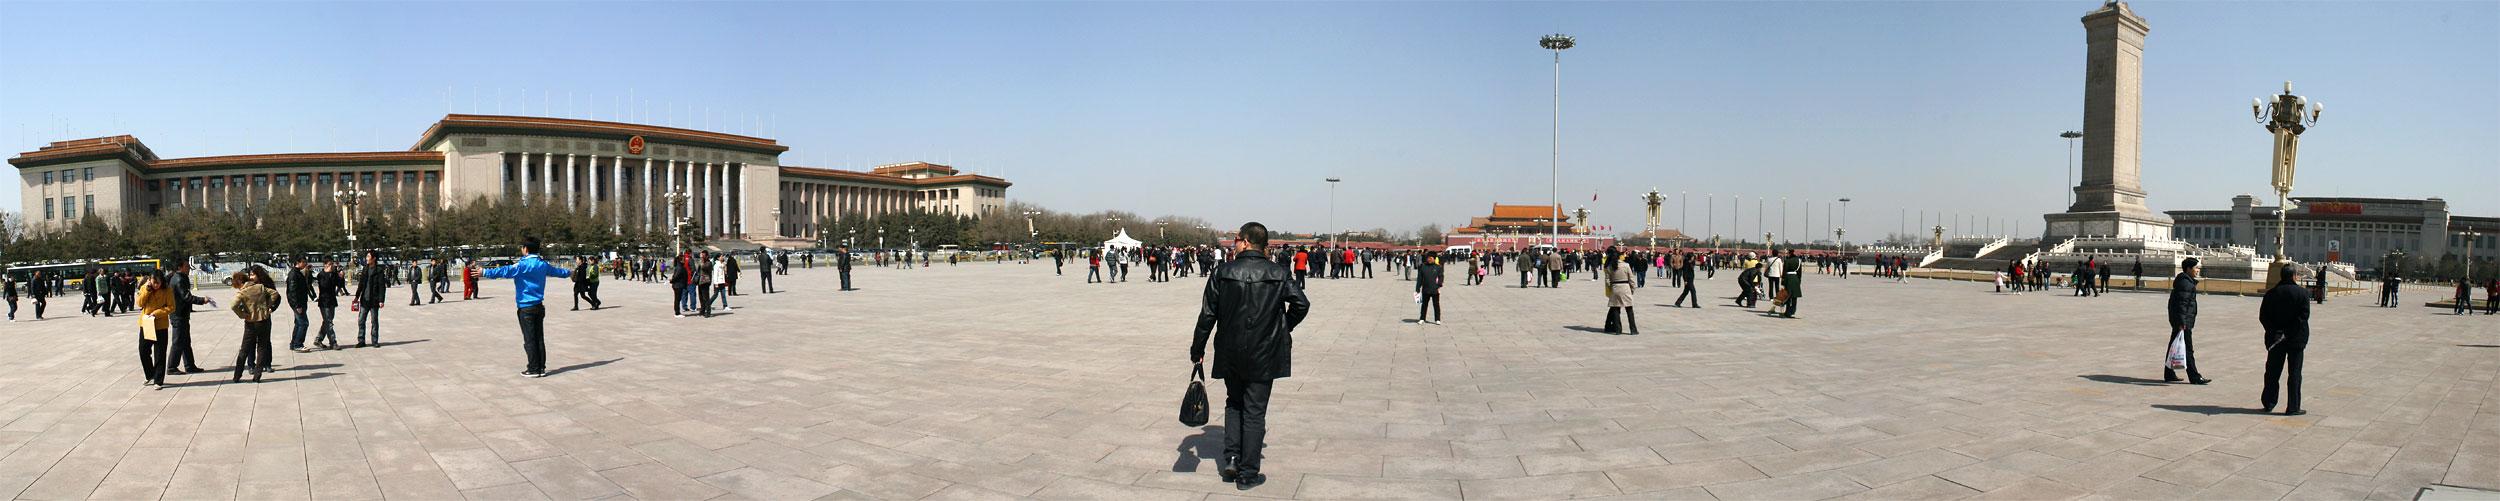 Tian'anmen Square Beijing